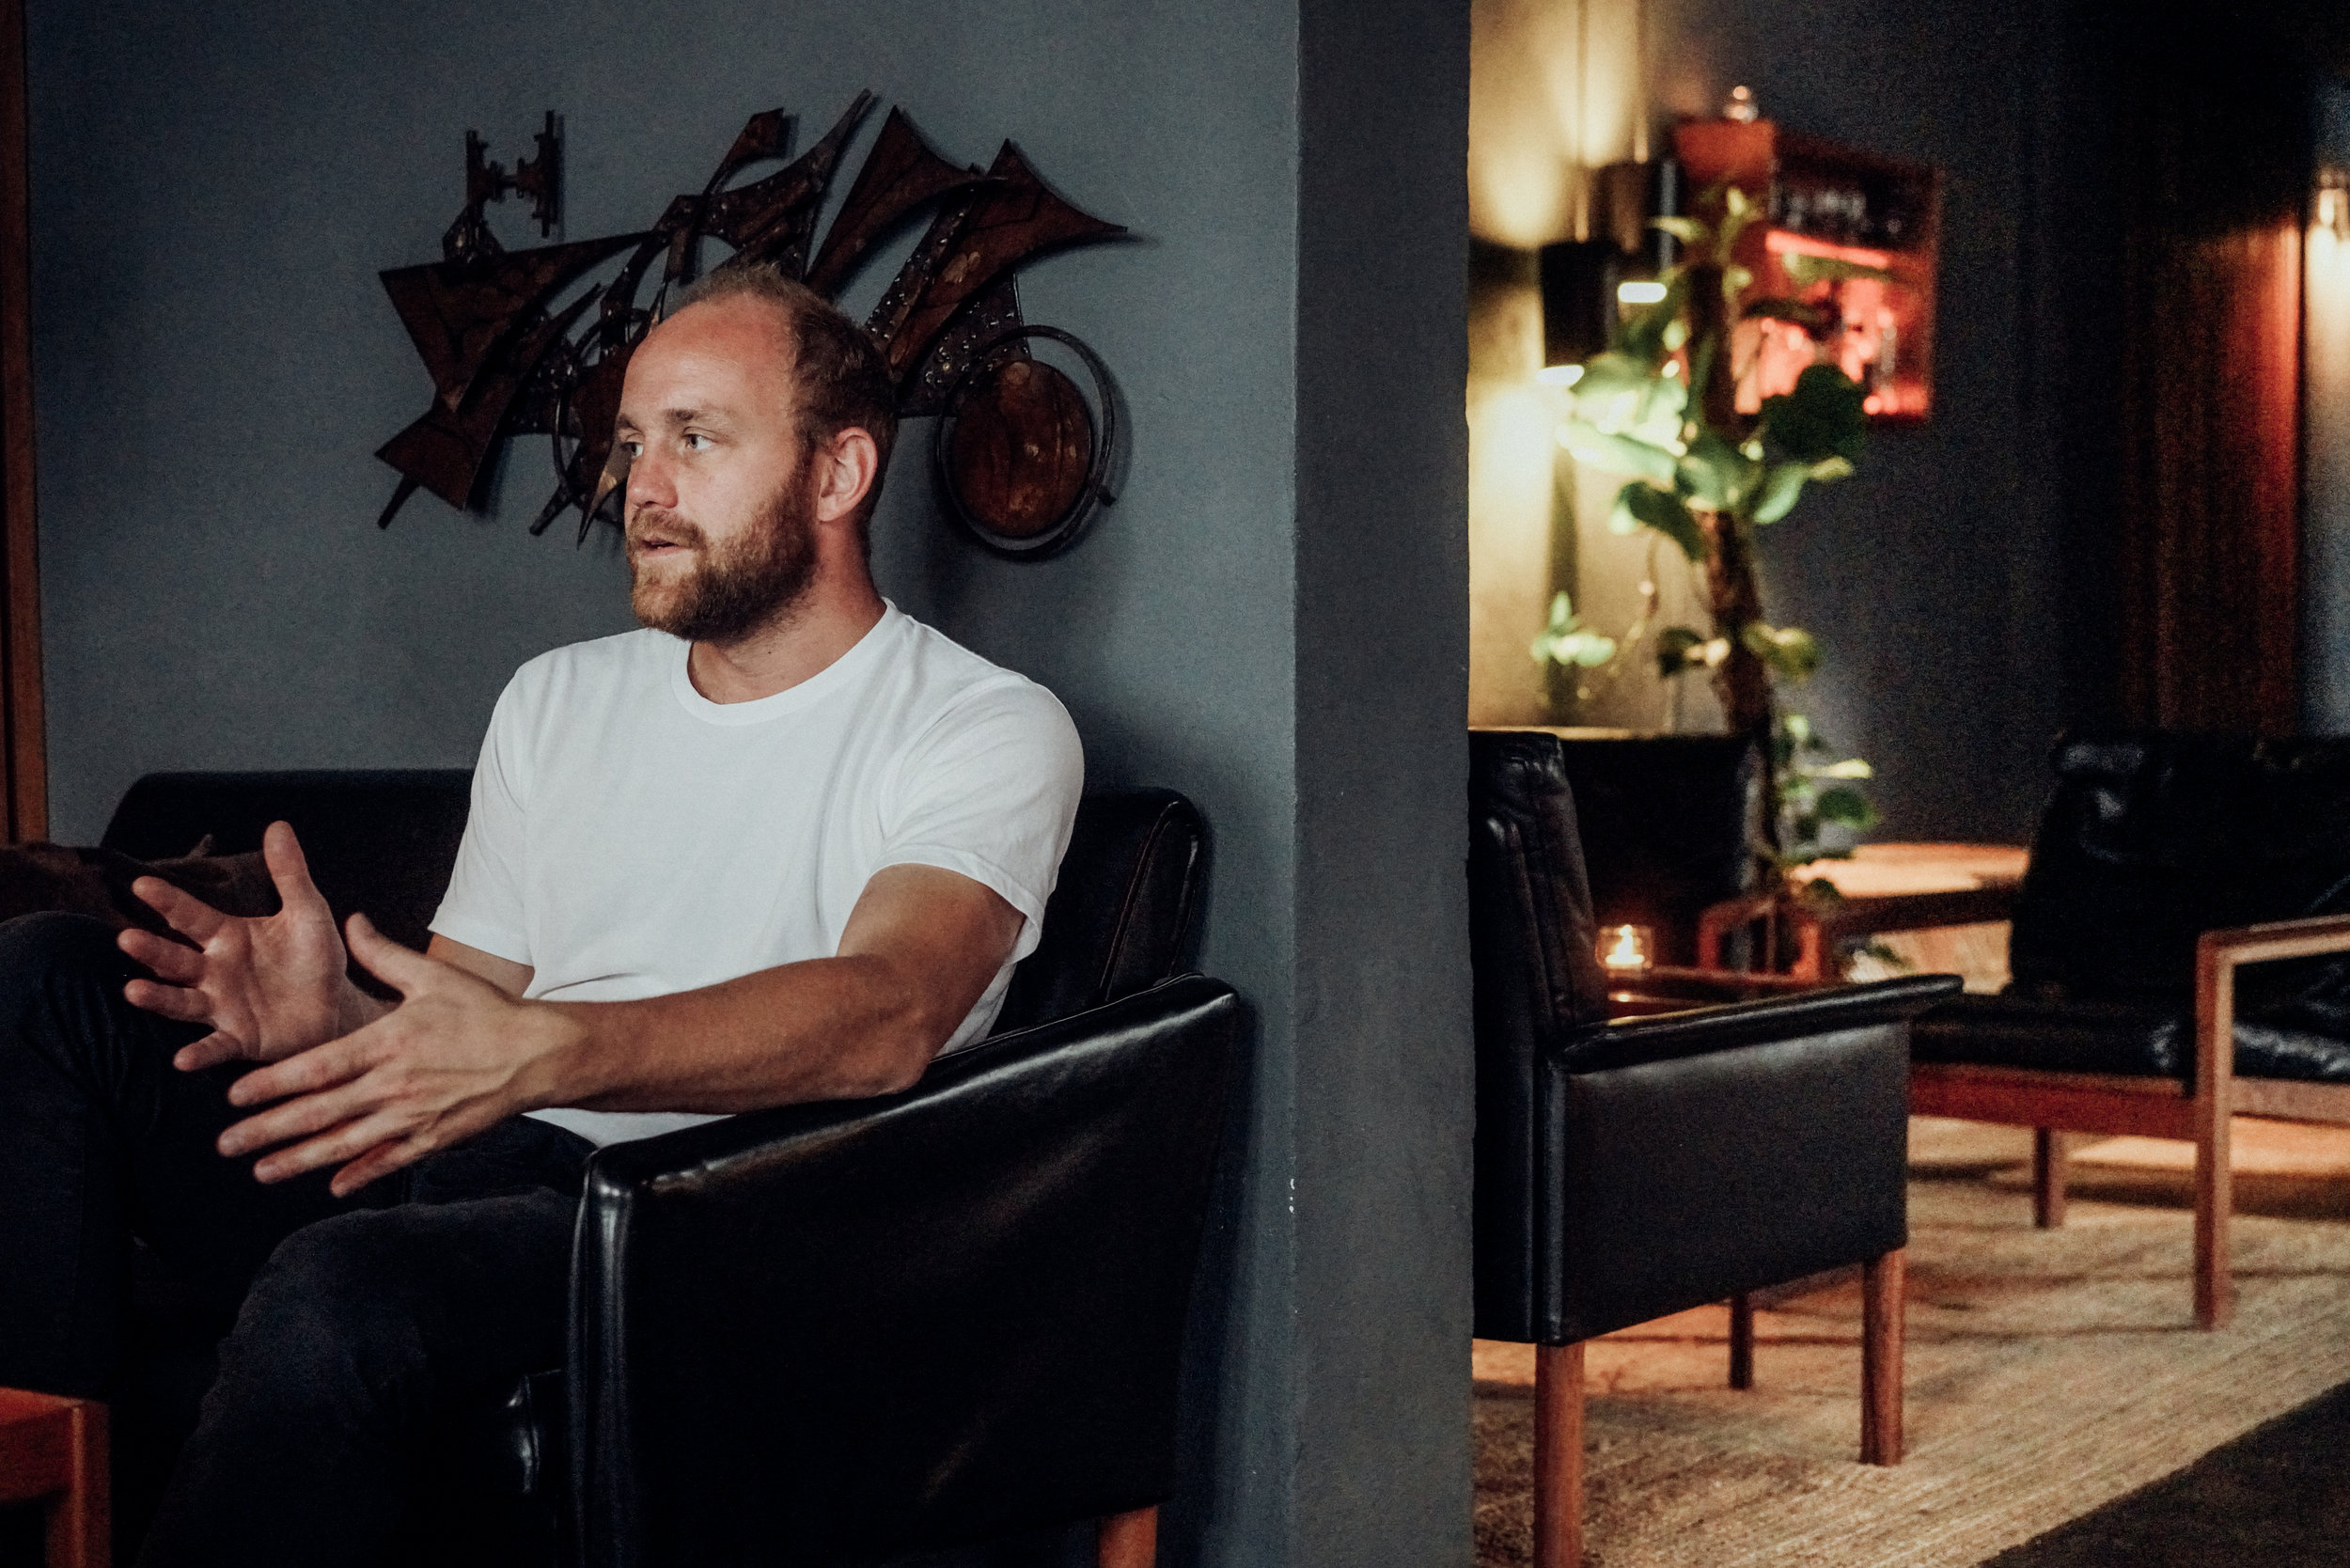 Kasper Riewe Henriksen talking about cocktails